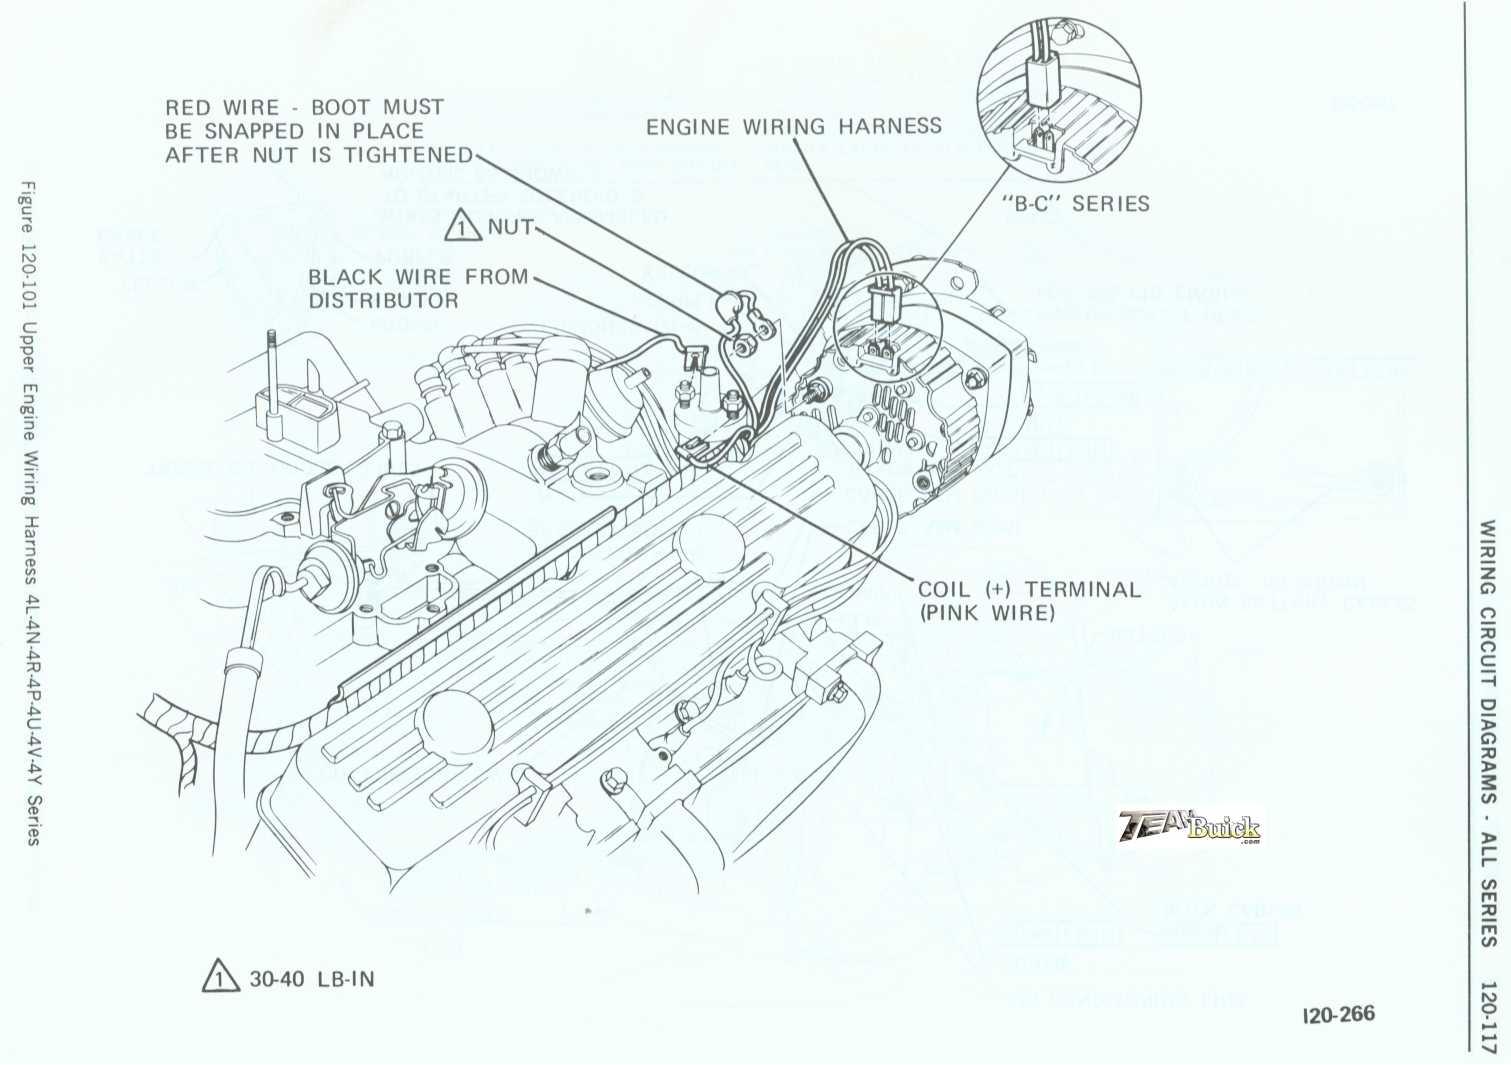 Buick Upper Engine Wiring Harness 4l 4n 4r 4p 4u 4v